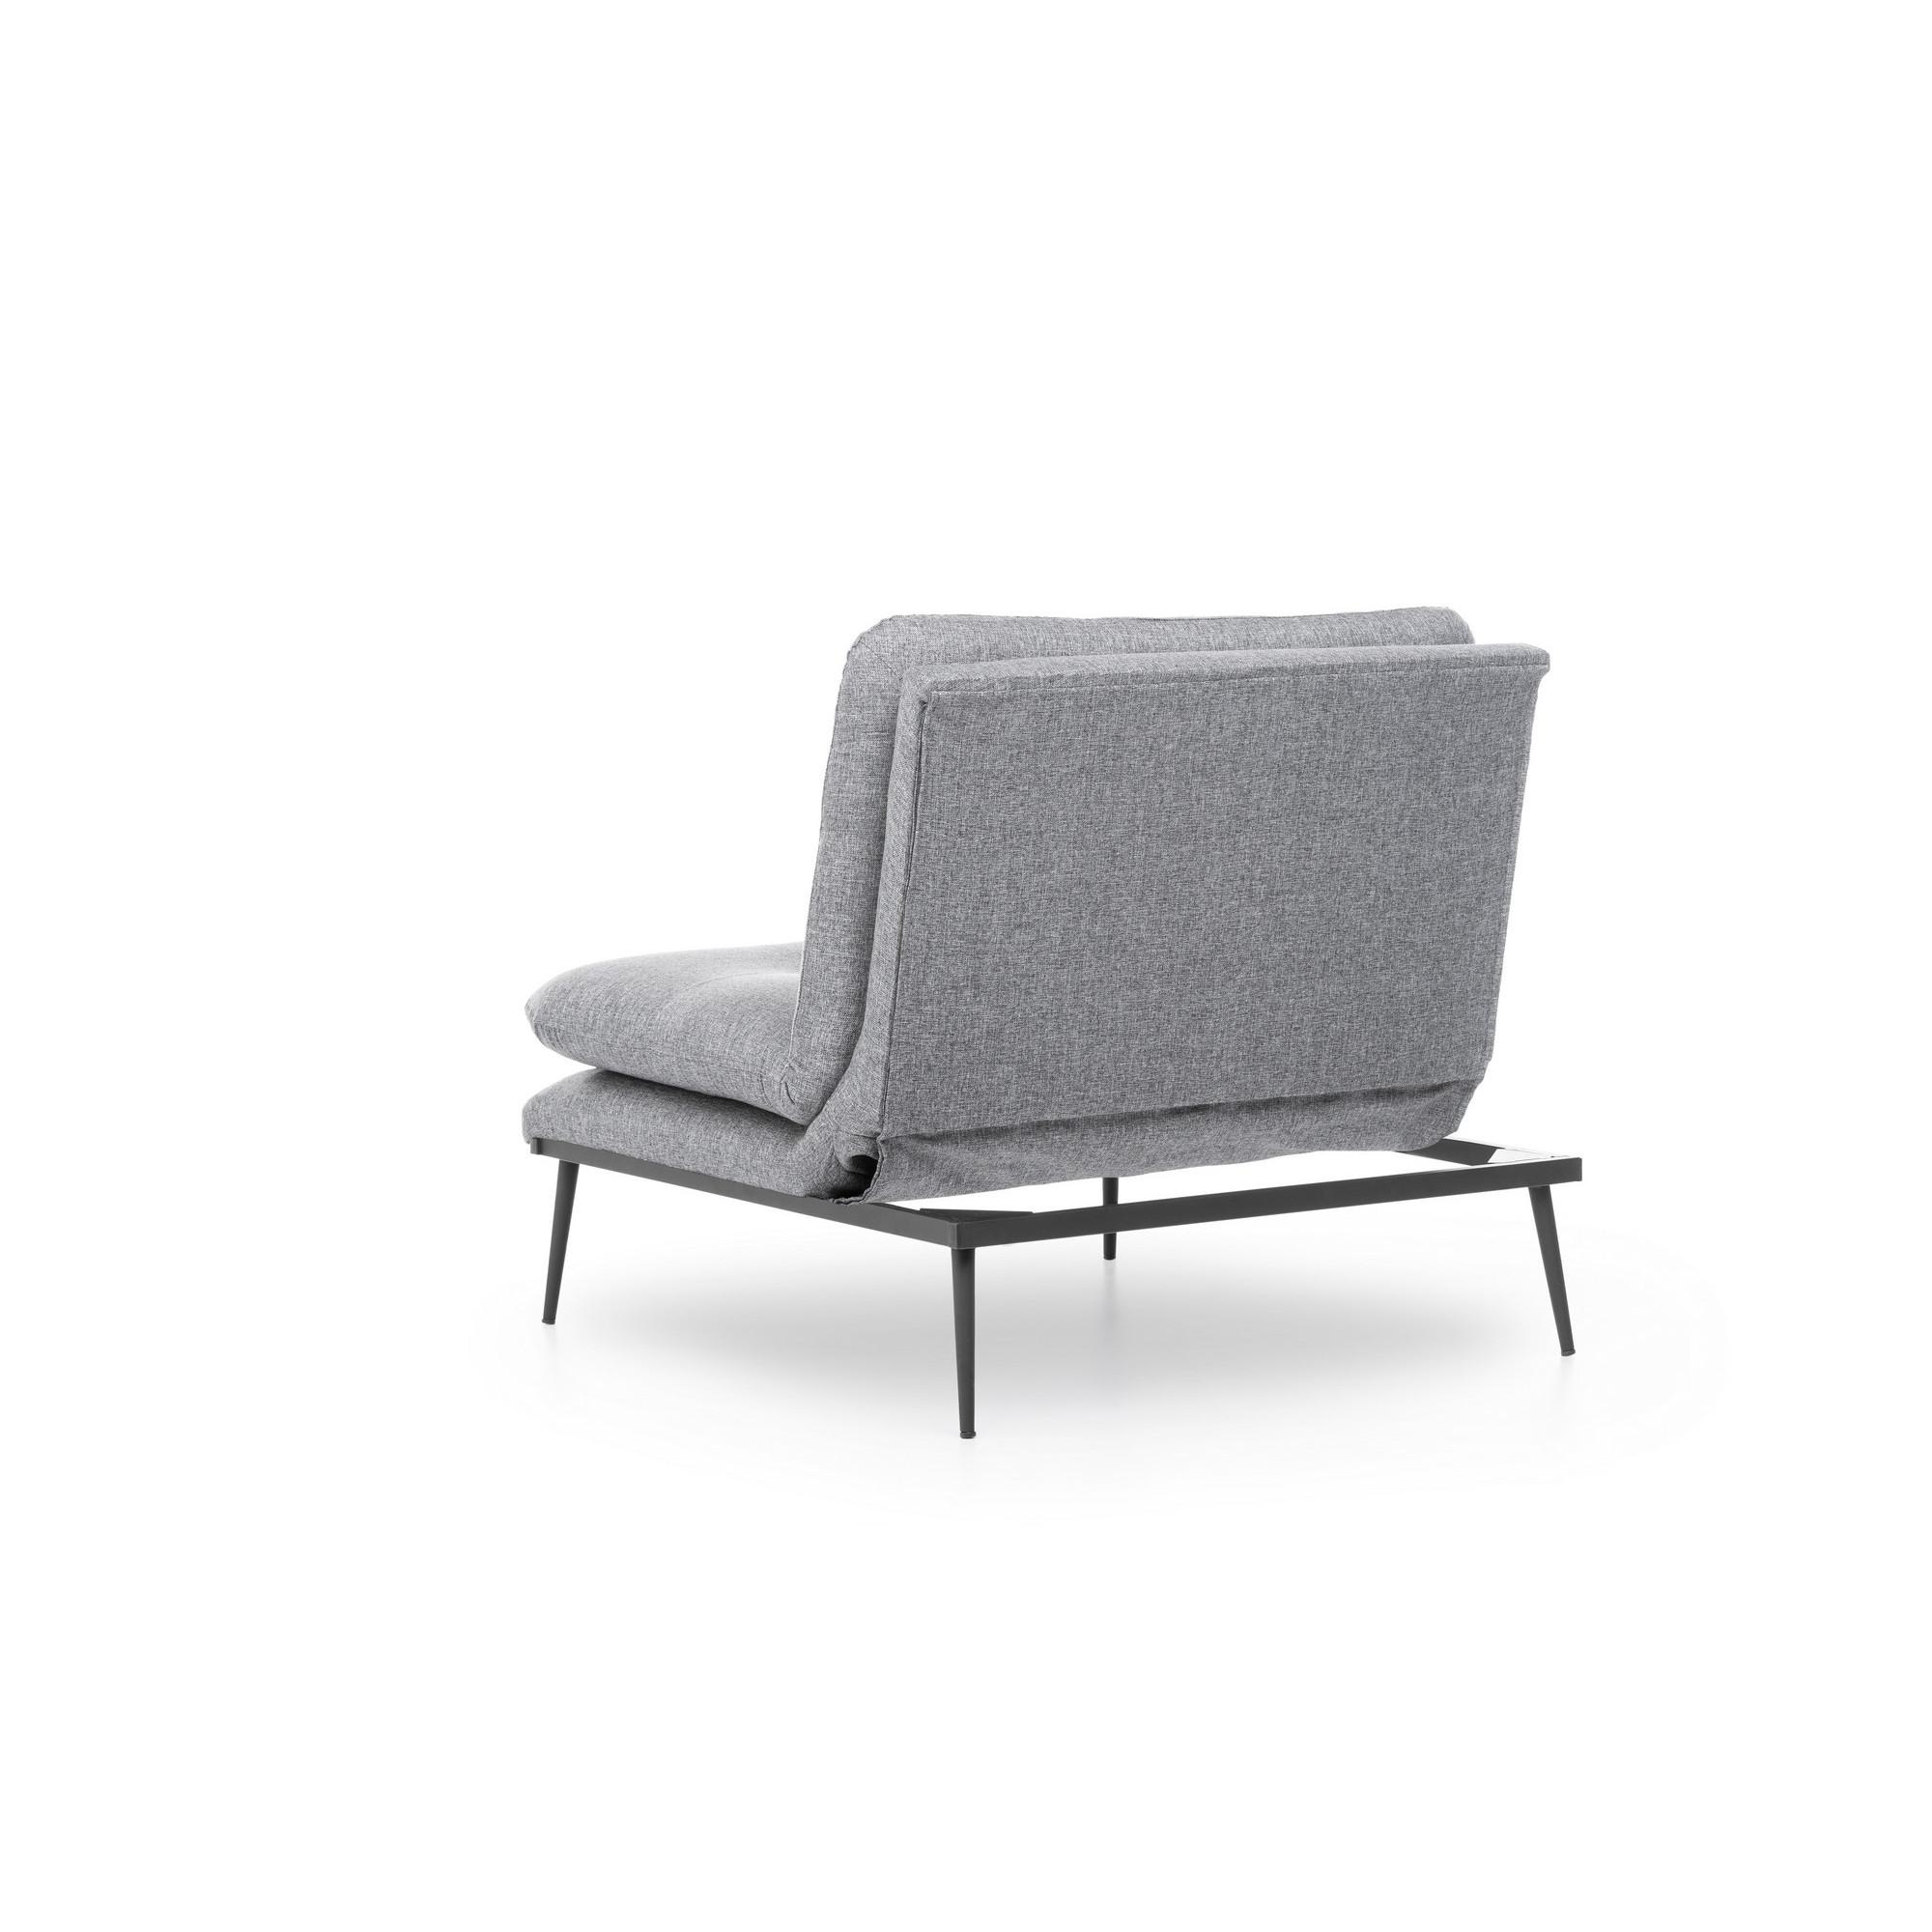 1 Seater Sofa Martin Solo   Grey